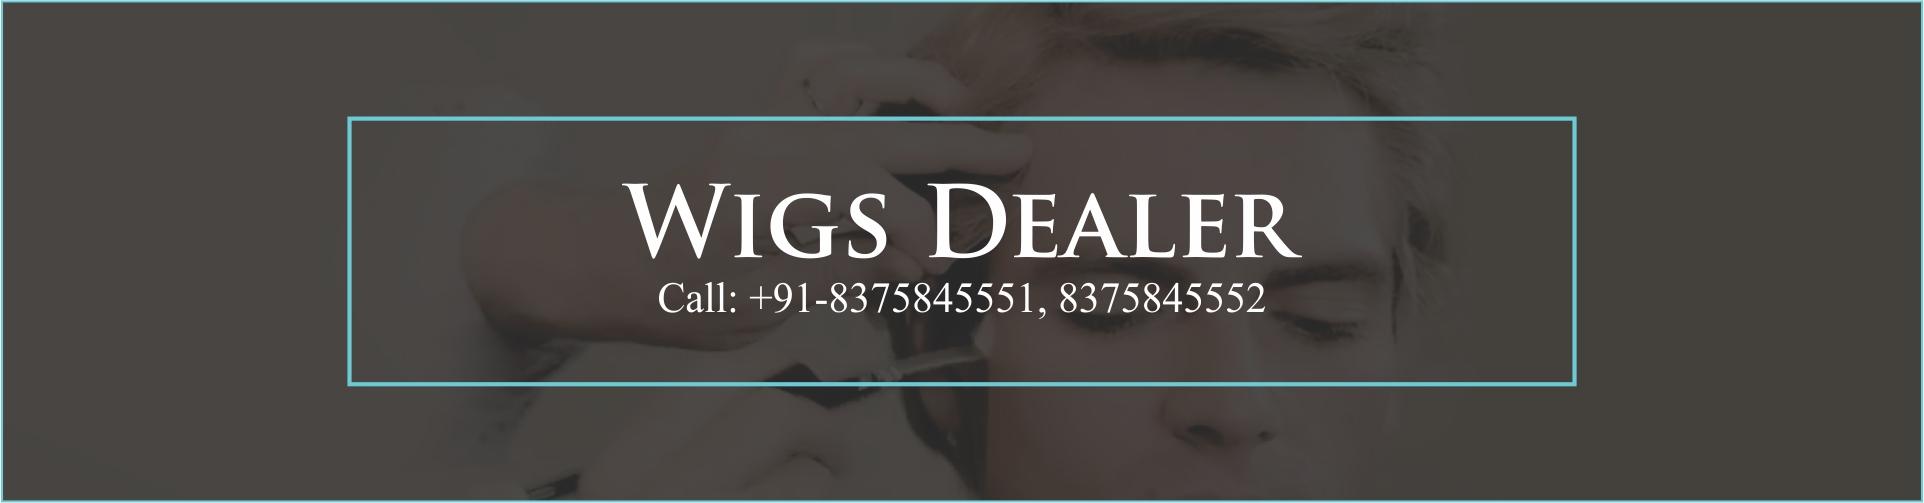 Wigs Dealer in Delhi- PHC Hair Clinic